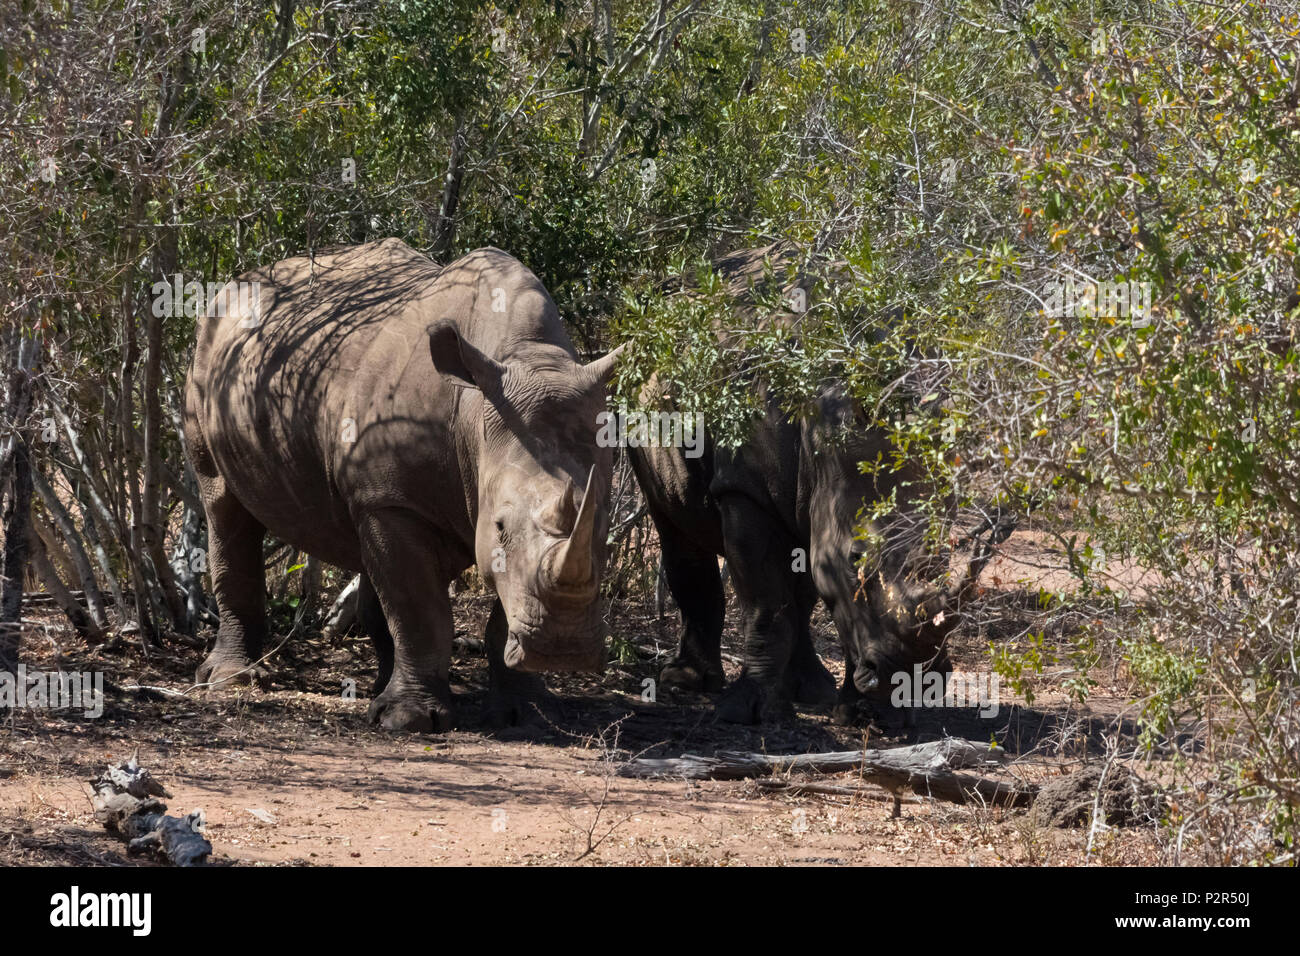 White Rhinos at Mkhaya Game Reserve, Swaziland - Stock Image